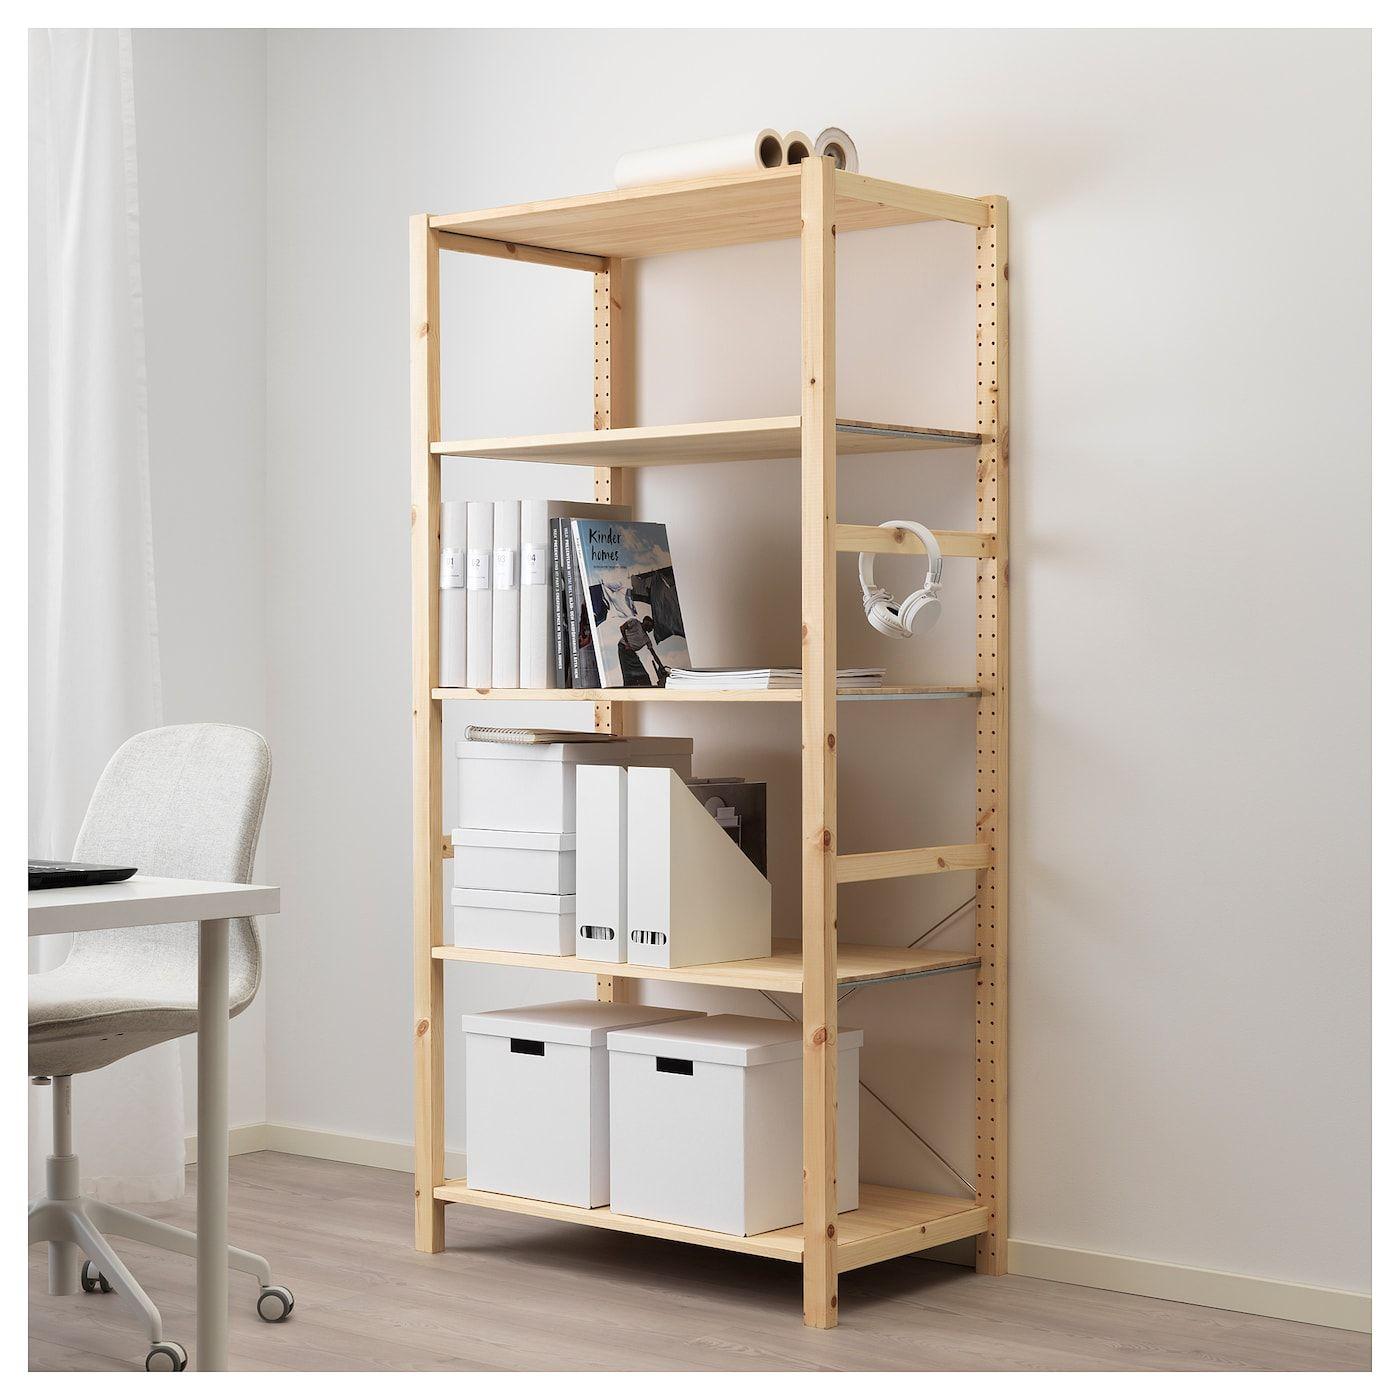 Ivar Shelf Unit Pine Width 35 Height 70 1 2 Add To Cart Pine Shelves Shelves Ikea Shelving Unit